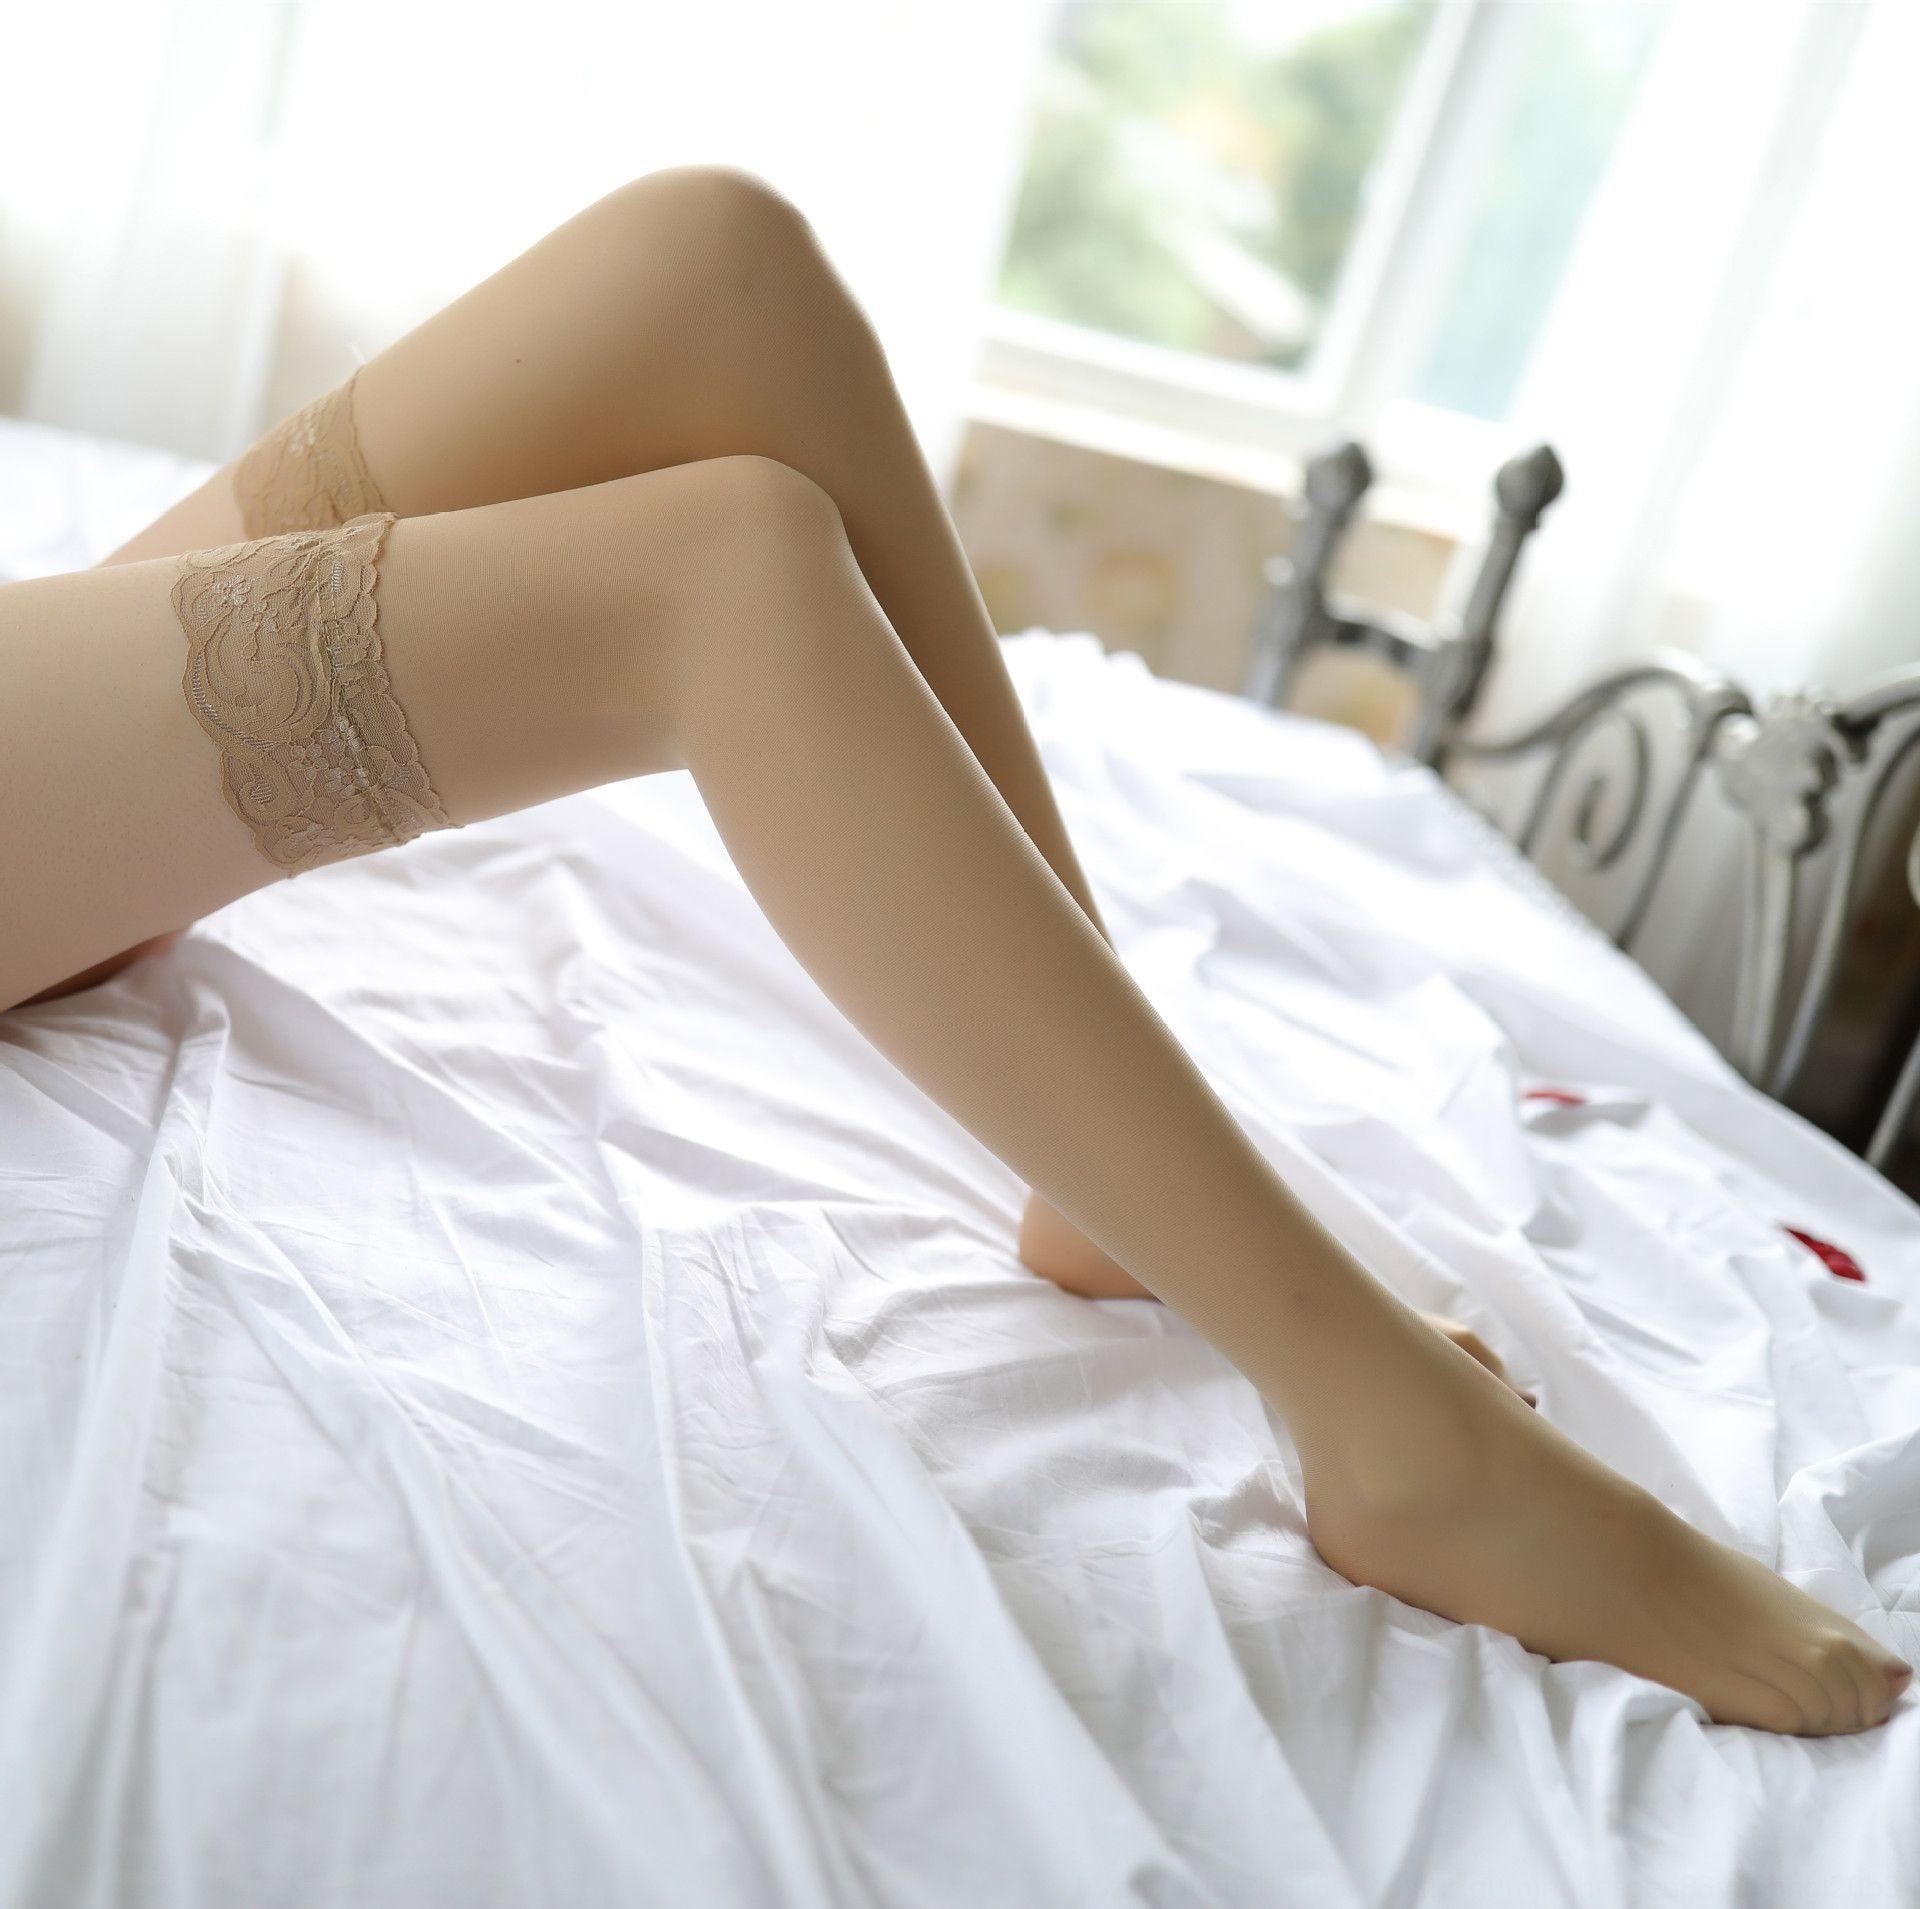 uniforme biancheria intima sexy tentazione sexy calzini trasparenti di zJYEV donne biancheria intima lunga calze di pizzo calze coscia pizzo